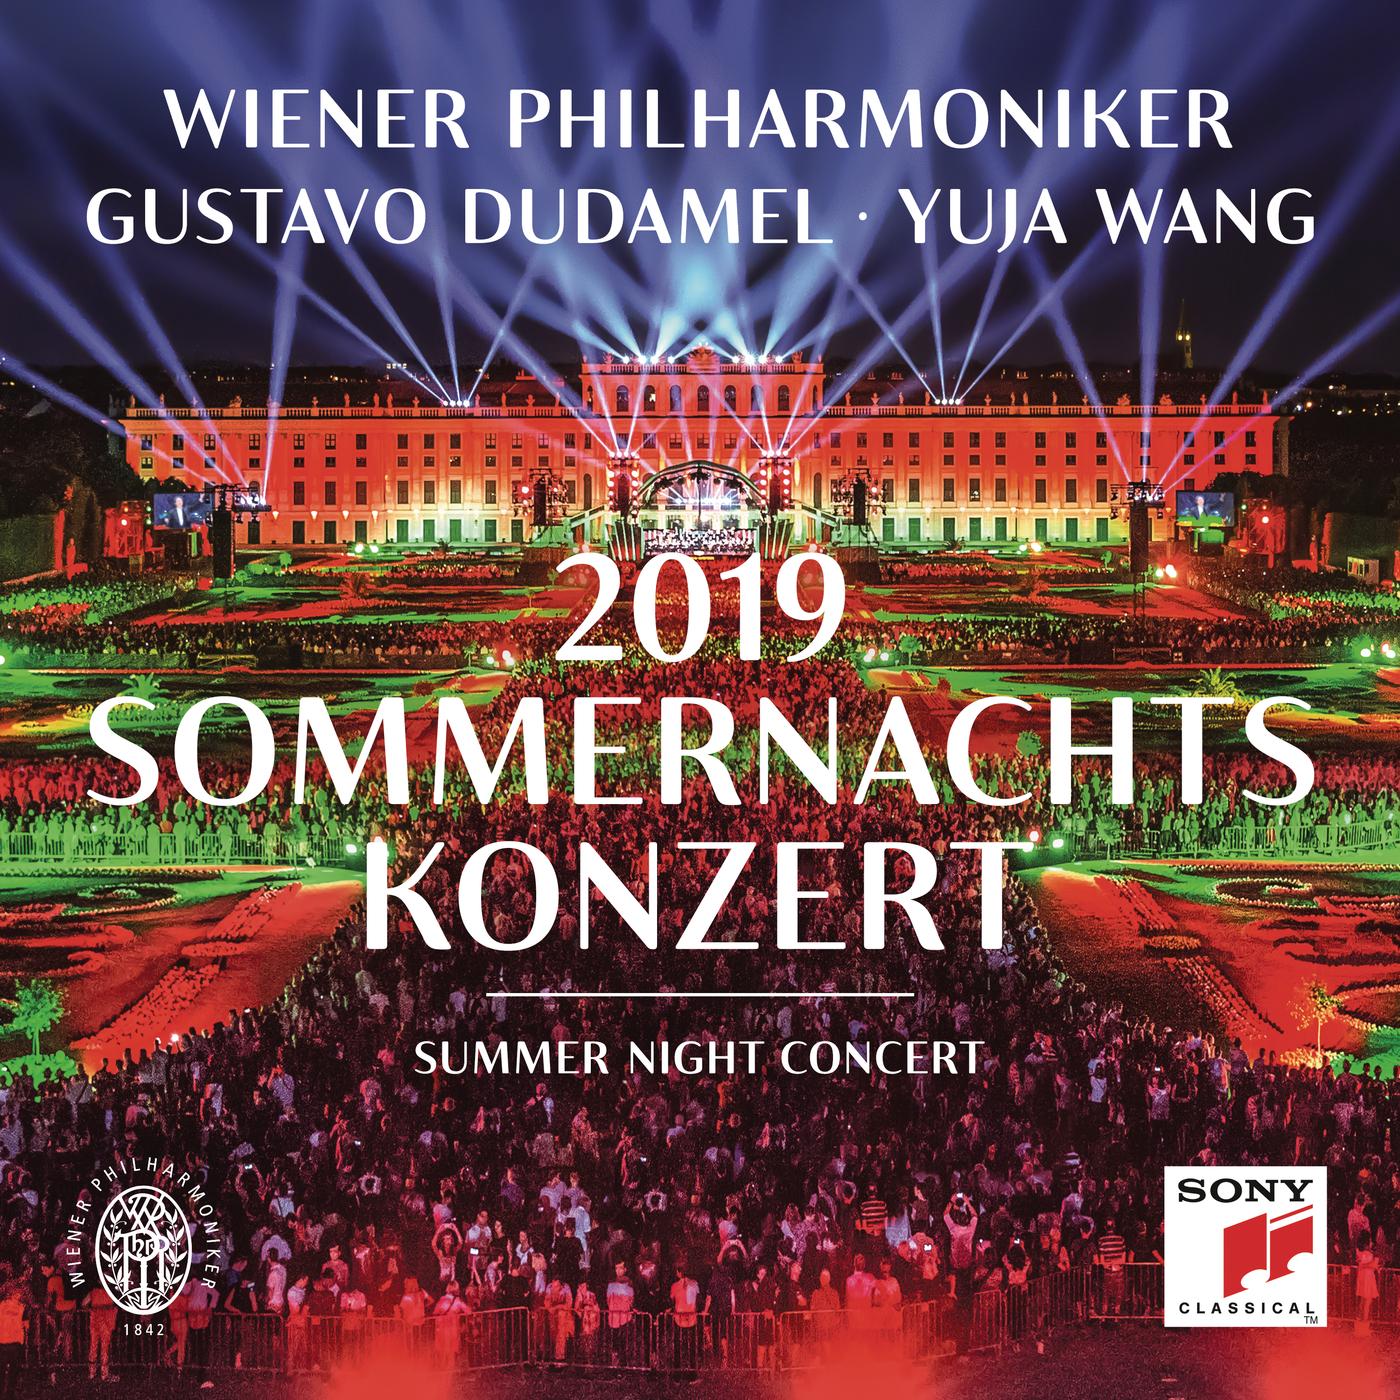 Sommernachtskonzert 2019 / Summer Night Concert 2019 - Gustavo Dudamel